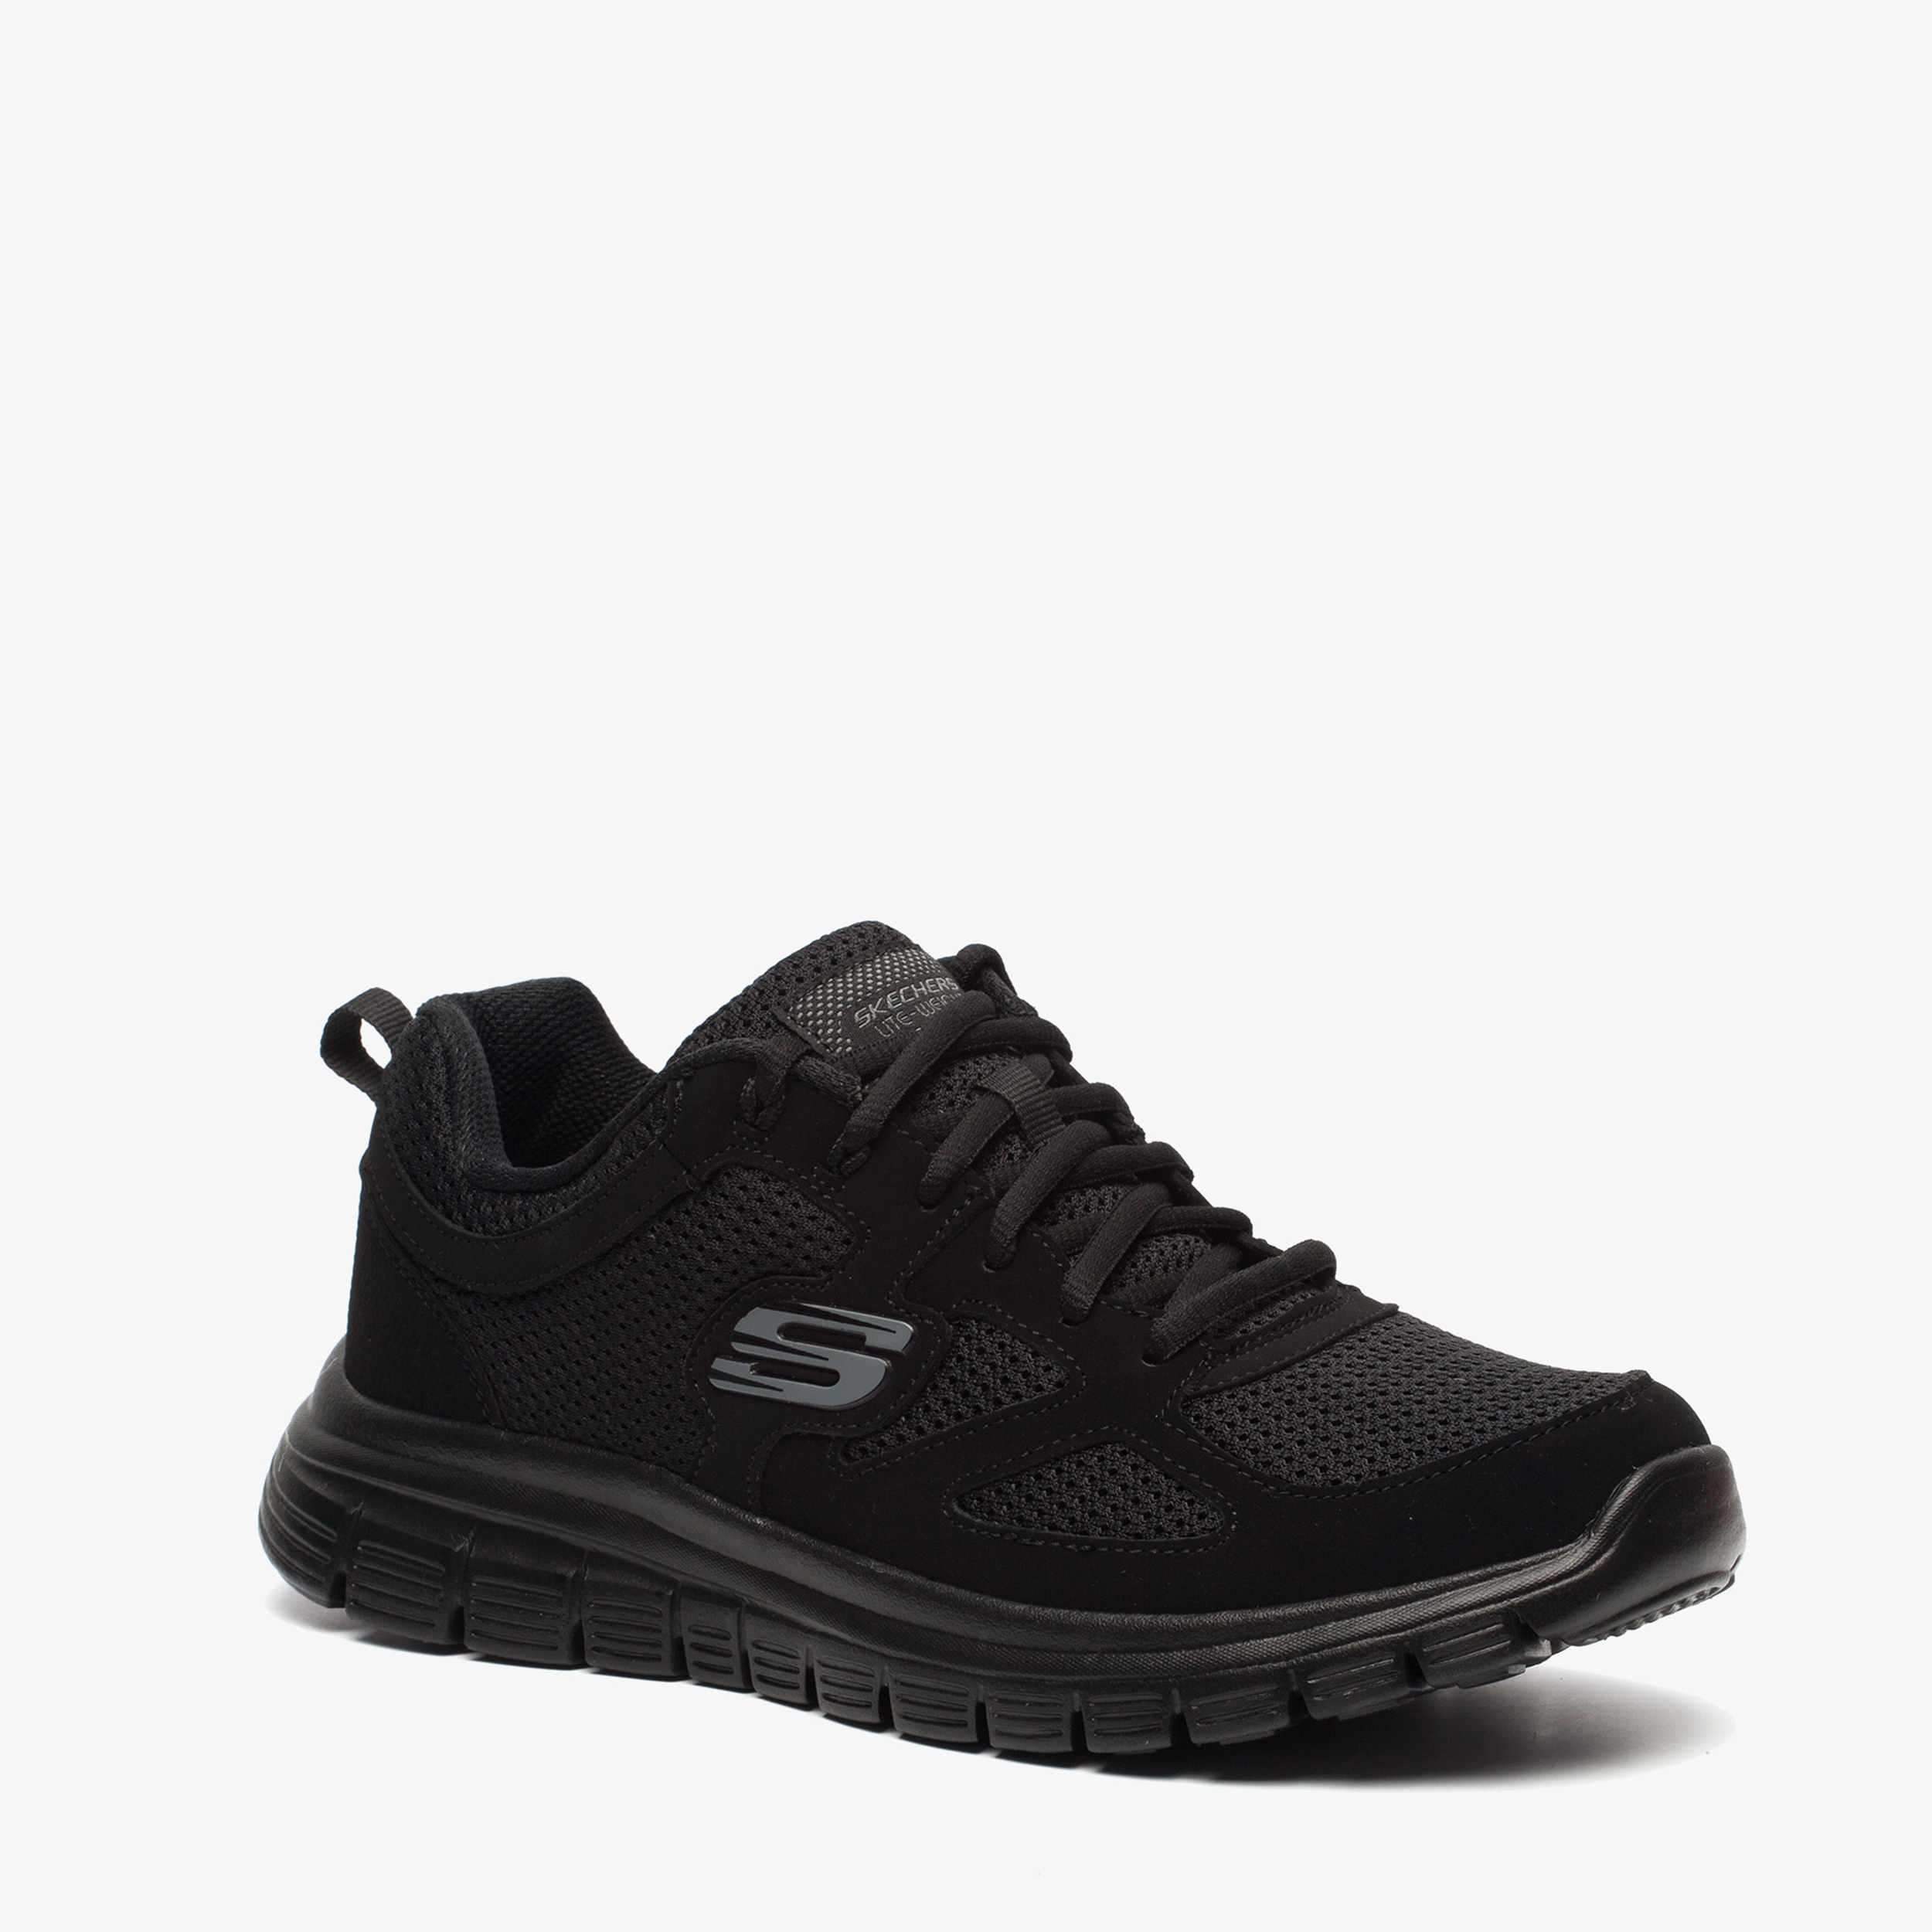 c031a5be9b3 skechers-burns-agoura-heren-sneakers.jpg